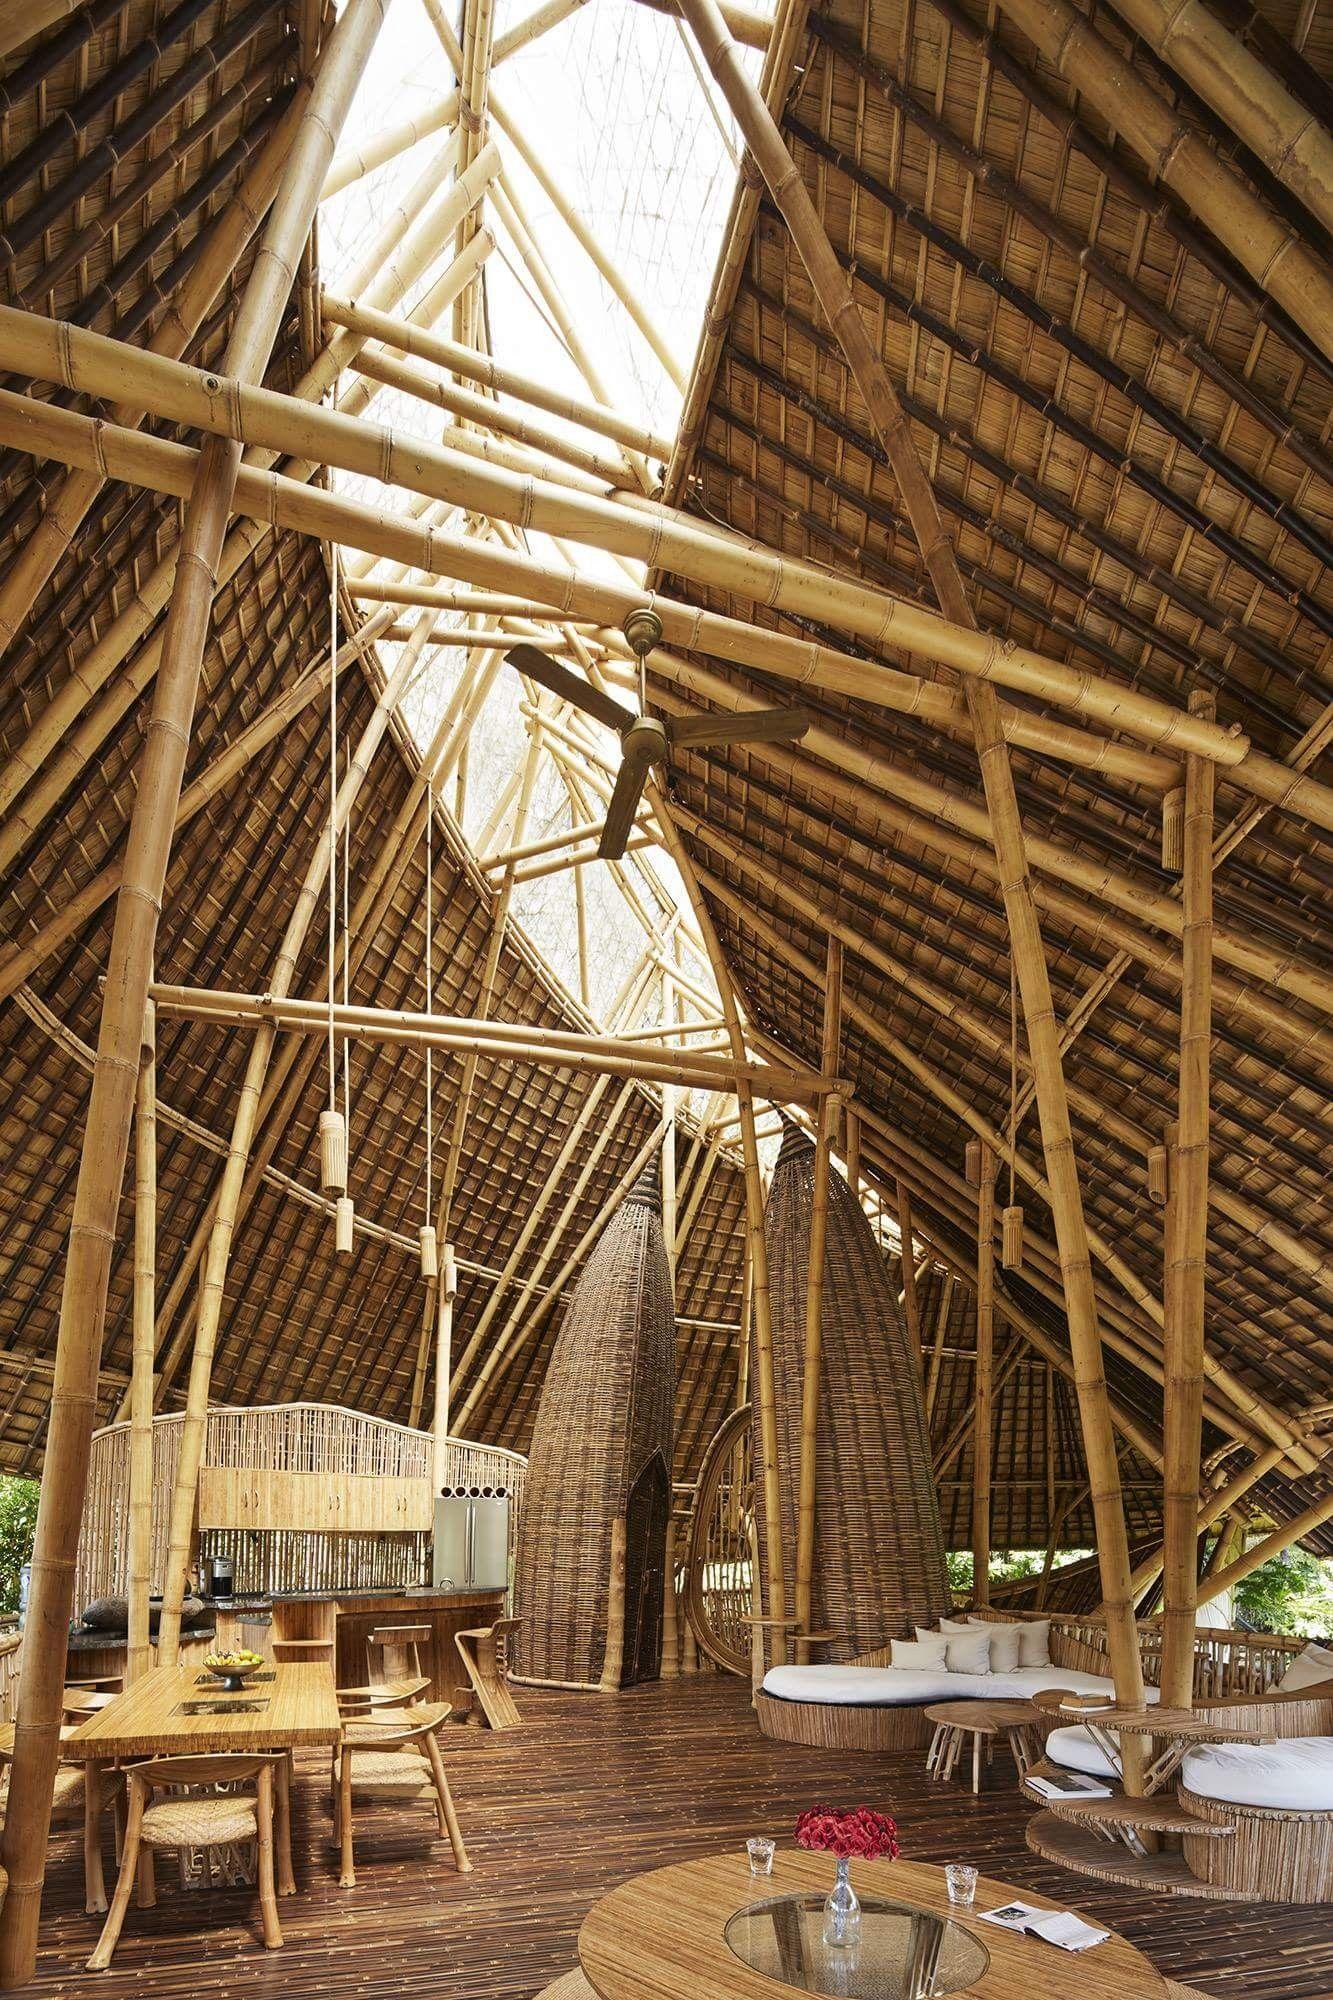 Desain Rumah Bambu : desain, rumah, bambu, Bamboo, House, Design, Arsitektur, Hijau,, Bambu,, Desain, Rumah